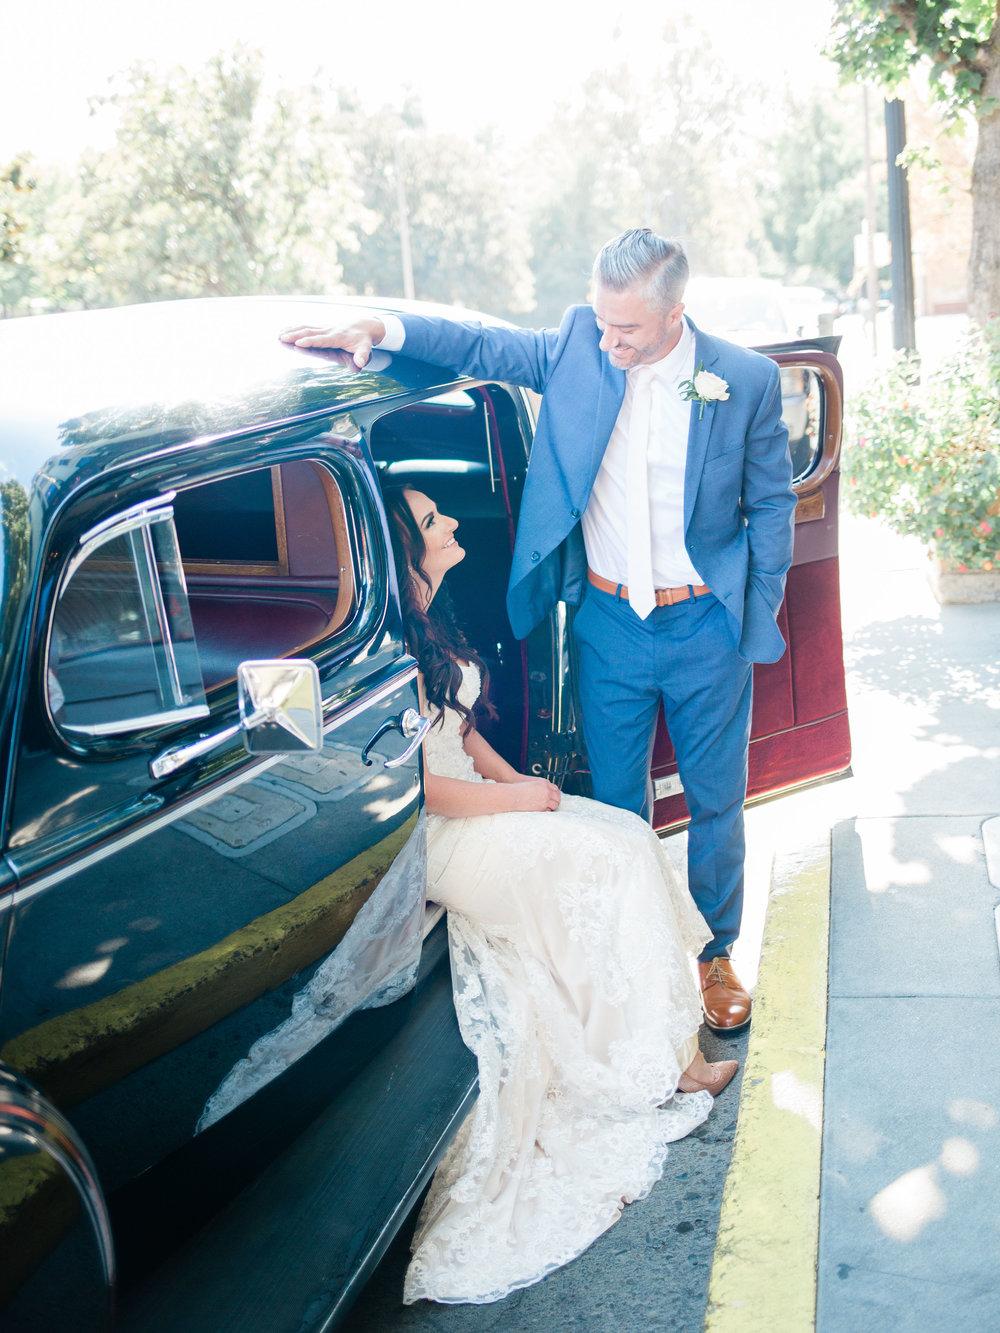 Tara + John's Wedding at the Historical Patrick Ranch Museum | Durham, California Wedding Photographer | Samantha McPherrin Wedding Photography | samanthamcpherrin.com